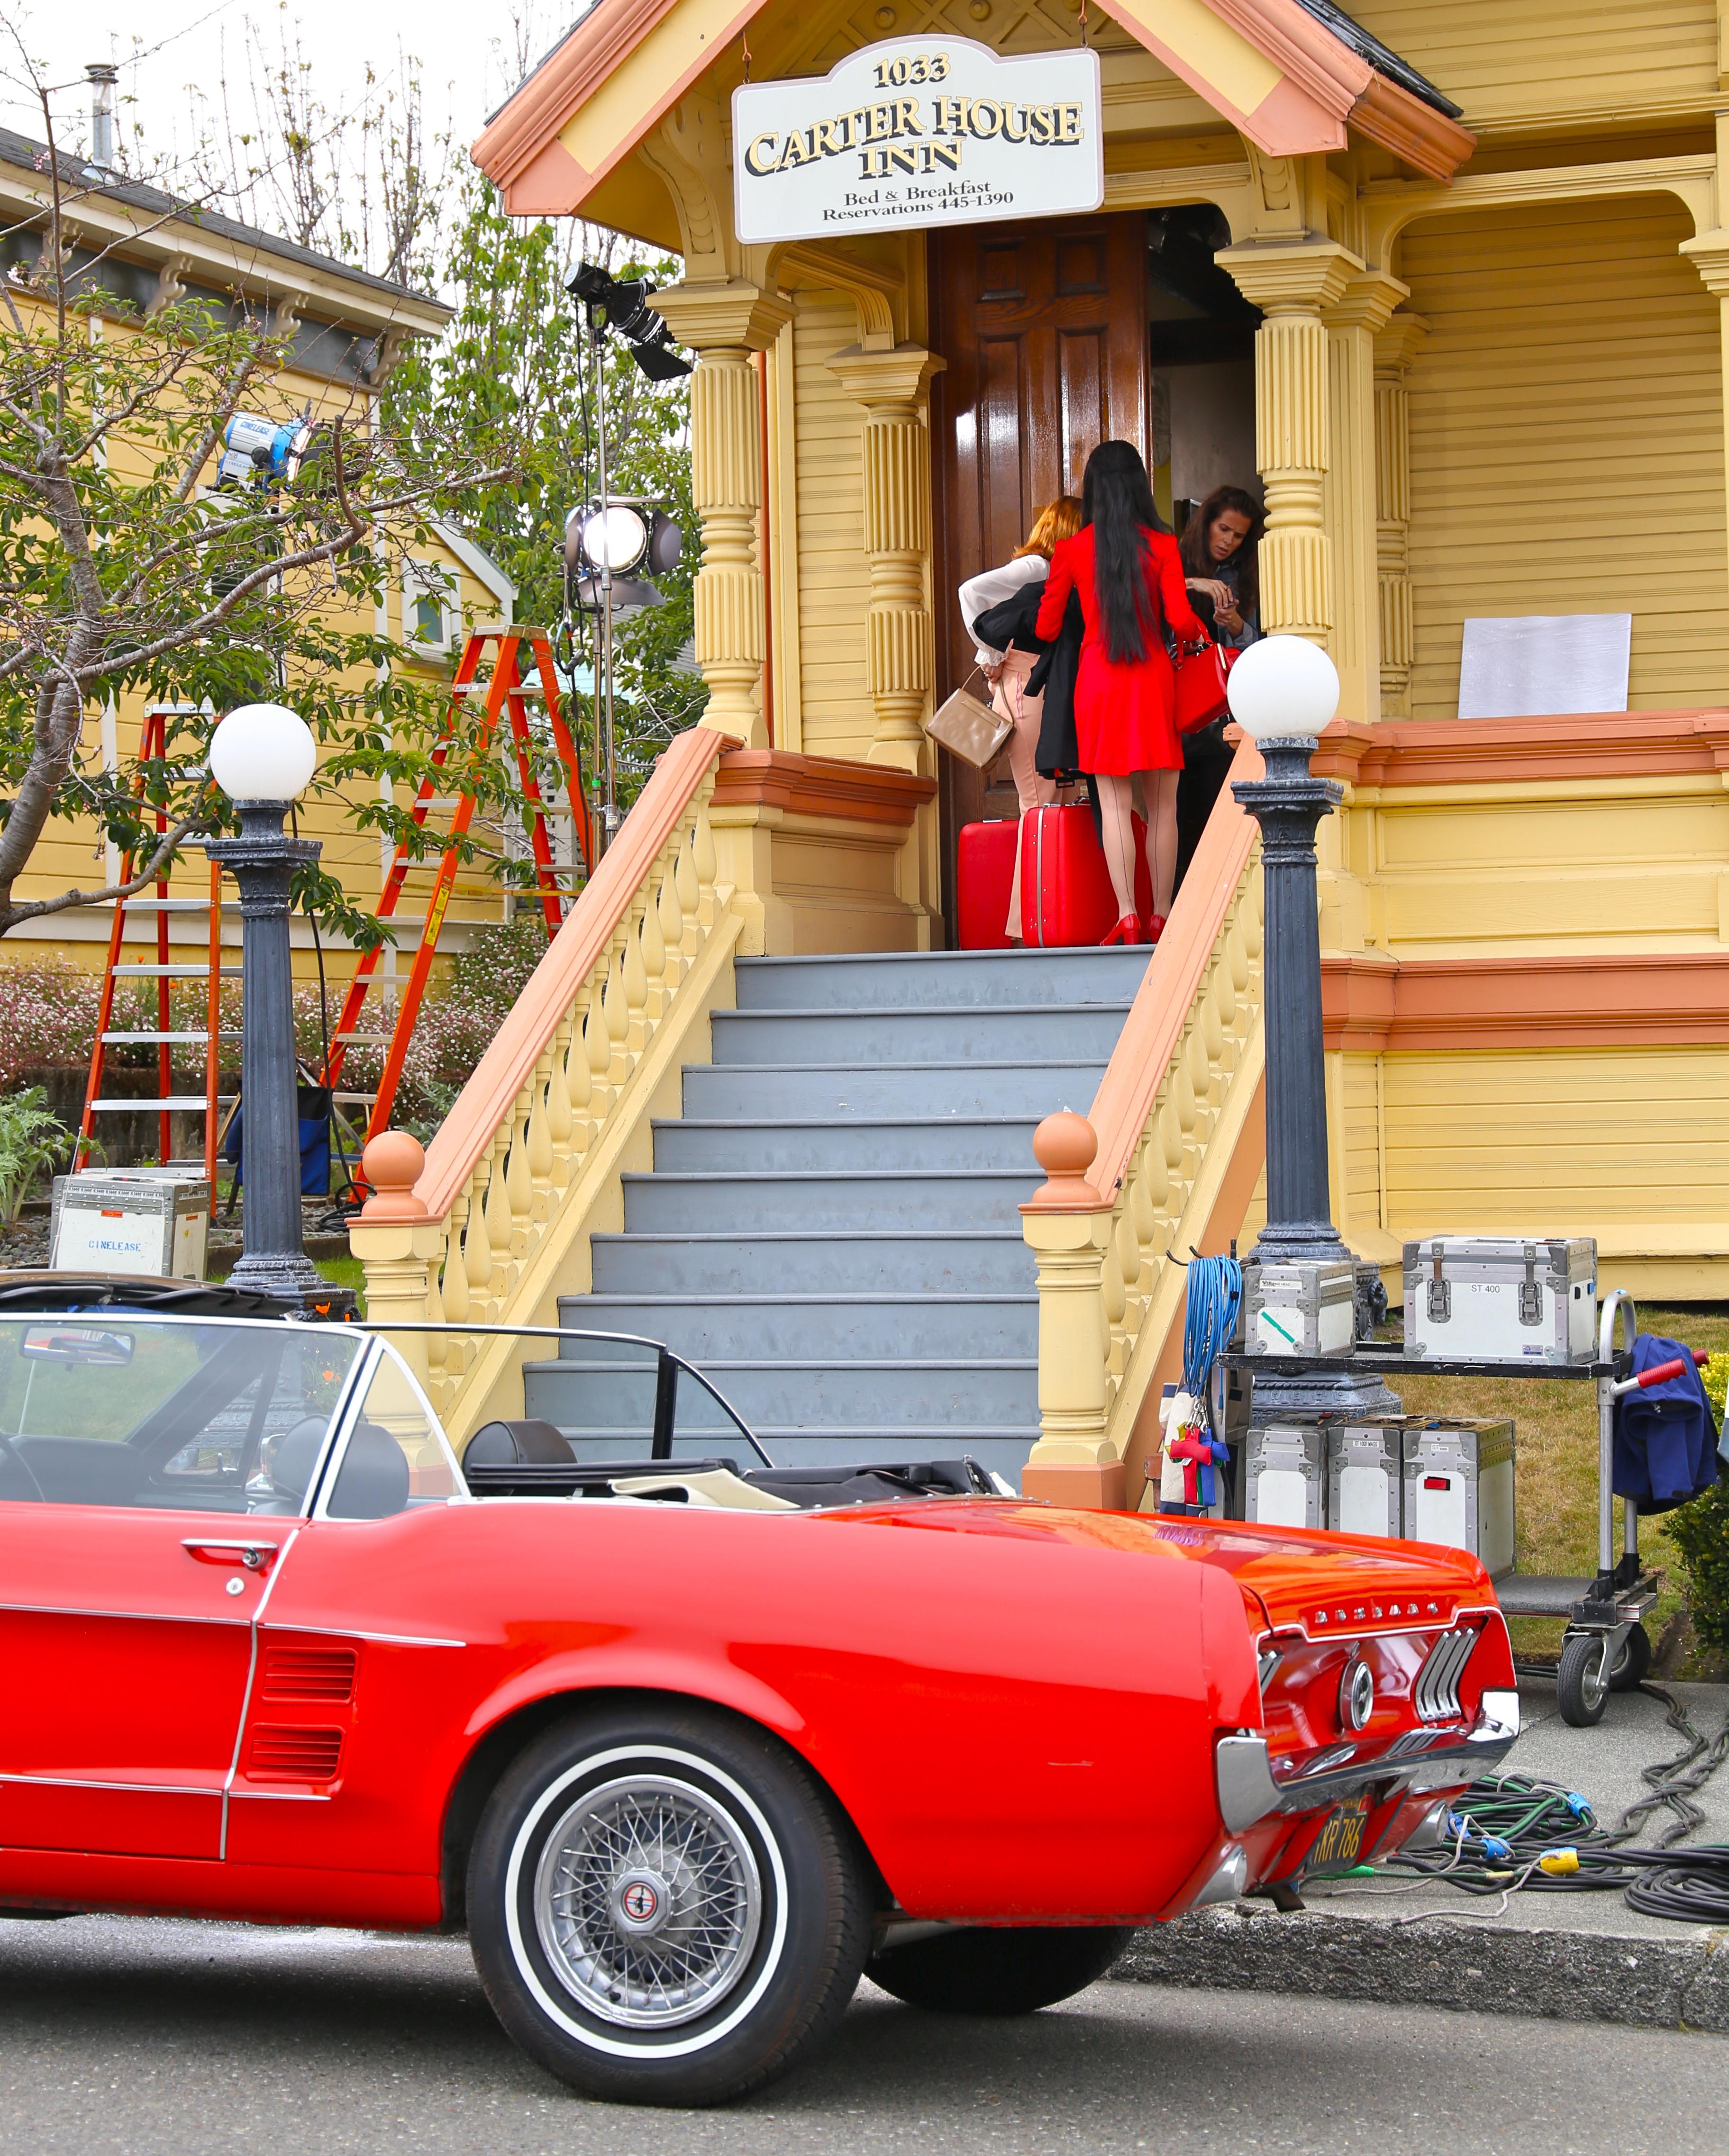 ... Film Crew Invades Arcata Plaza | Lost Coast Outpost | Humboldt County